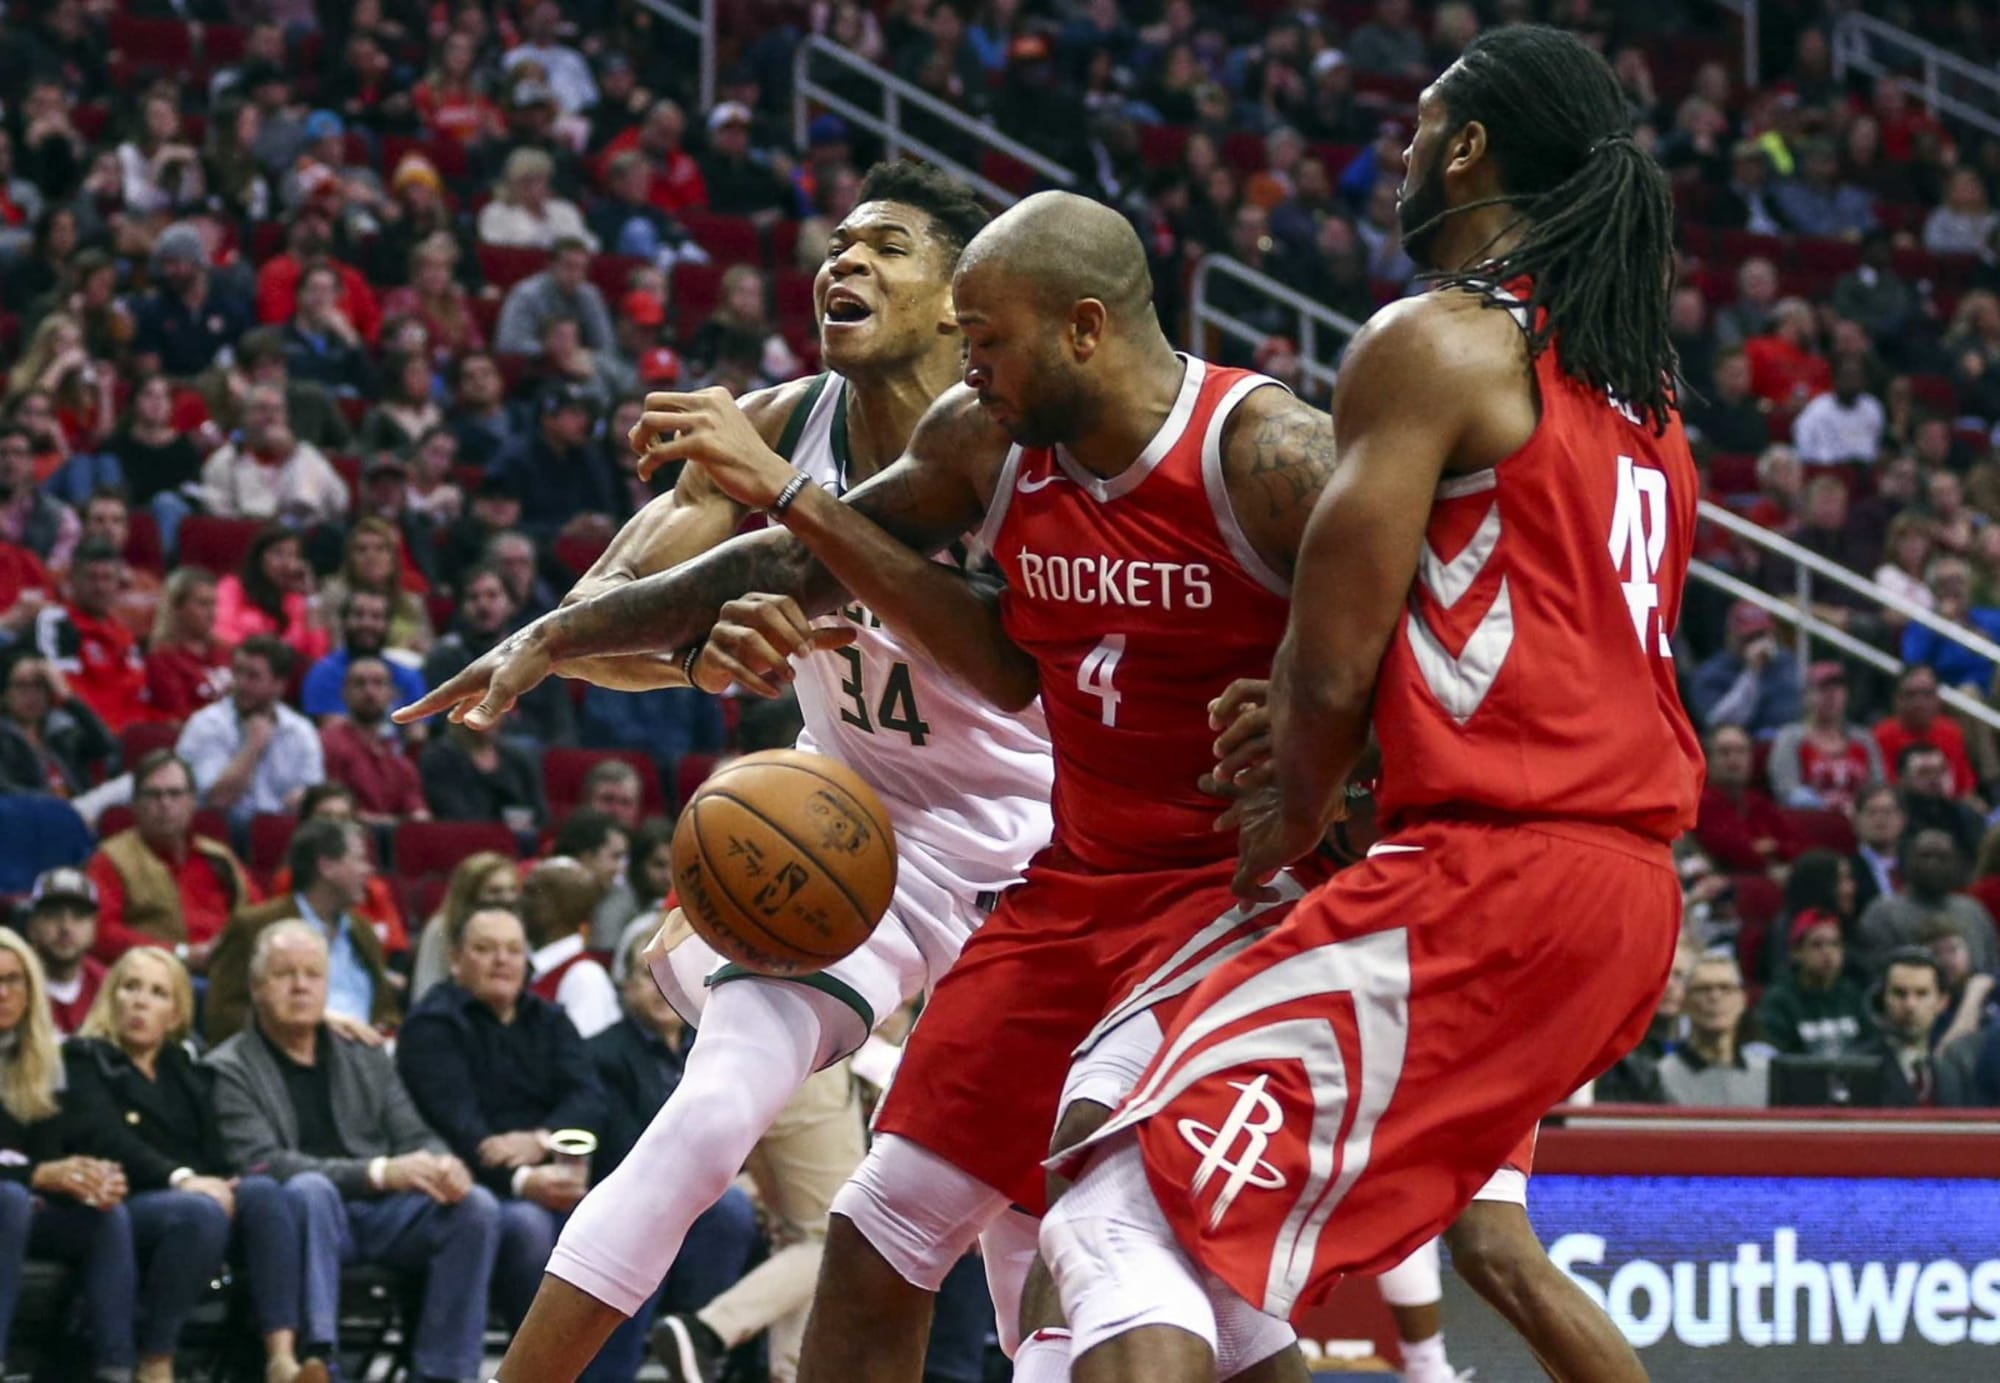 Milwaukee Bucks: Acquiring P.J. Tucker will not solve defensive issues